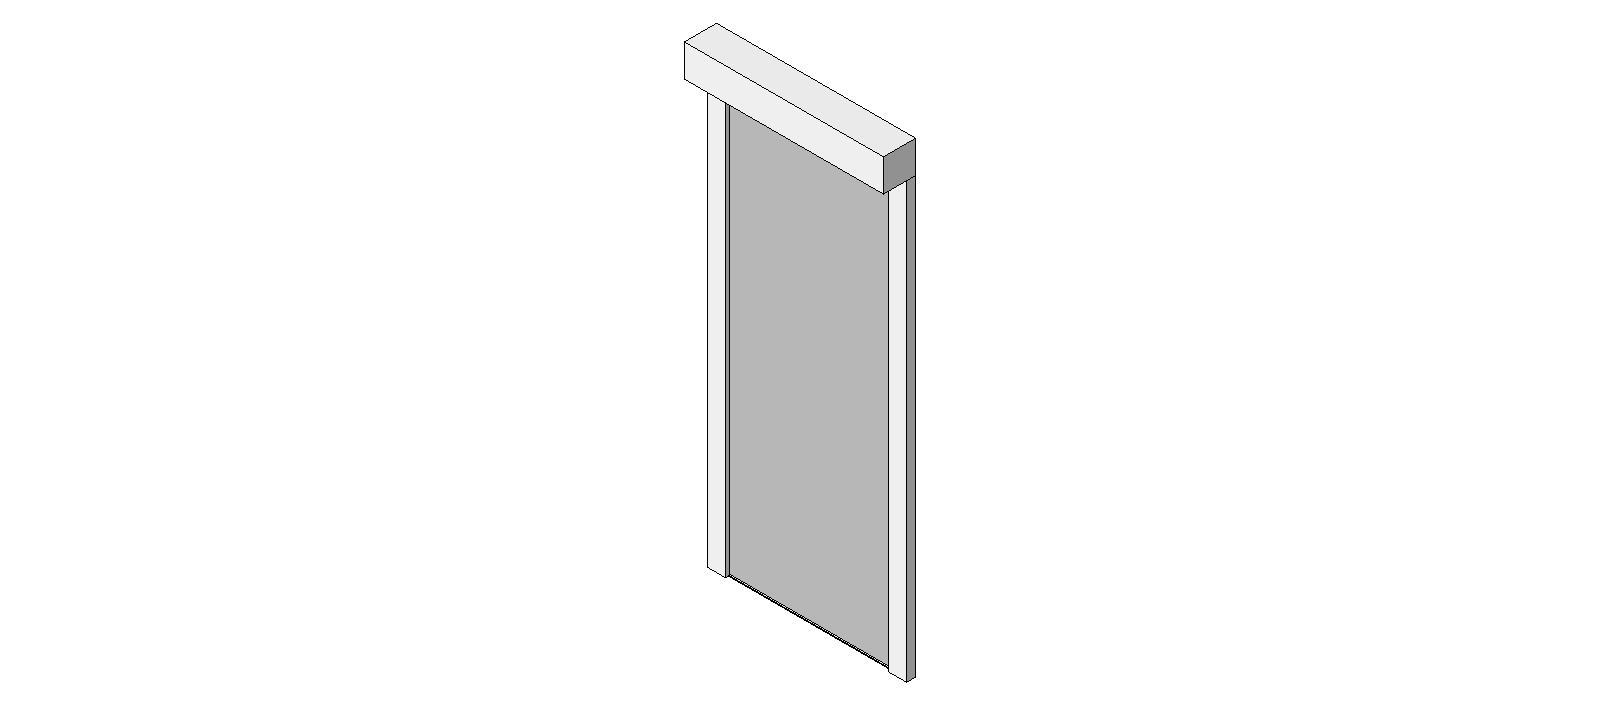 Fire Smoke Curtains: Custom: DSI SD BIM from Door Systems, Inc.